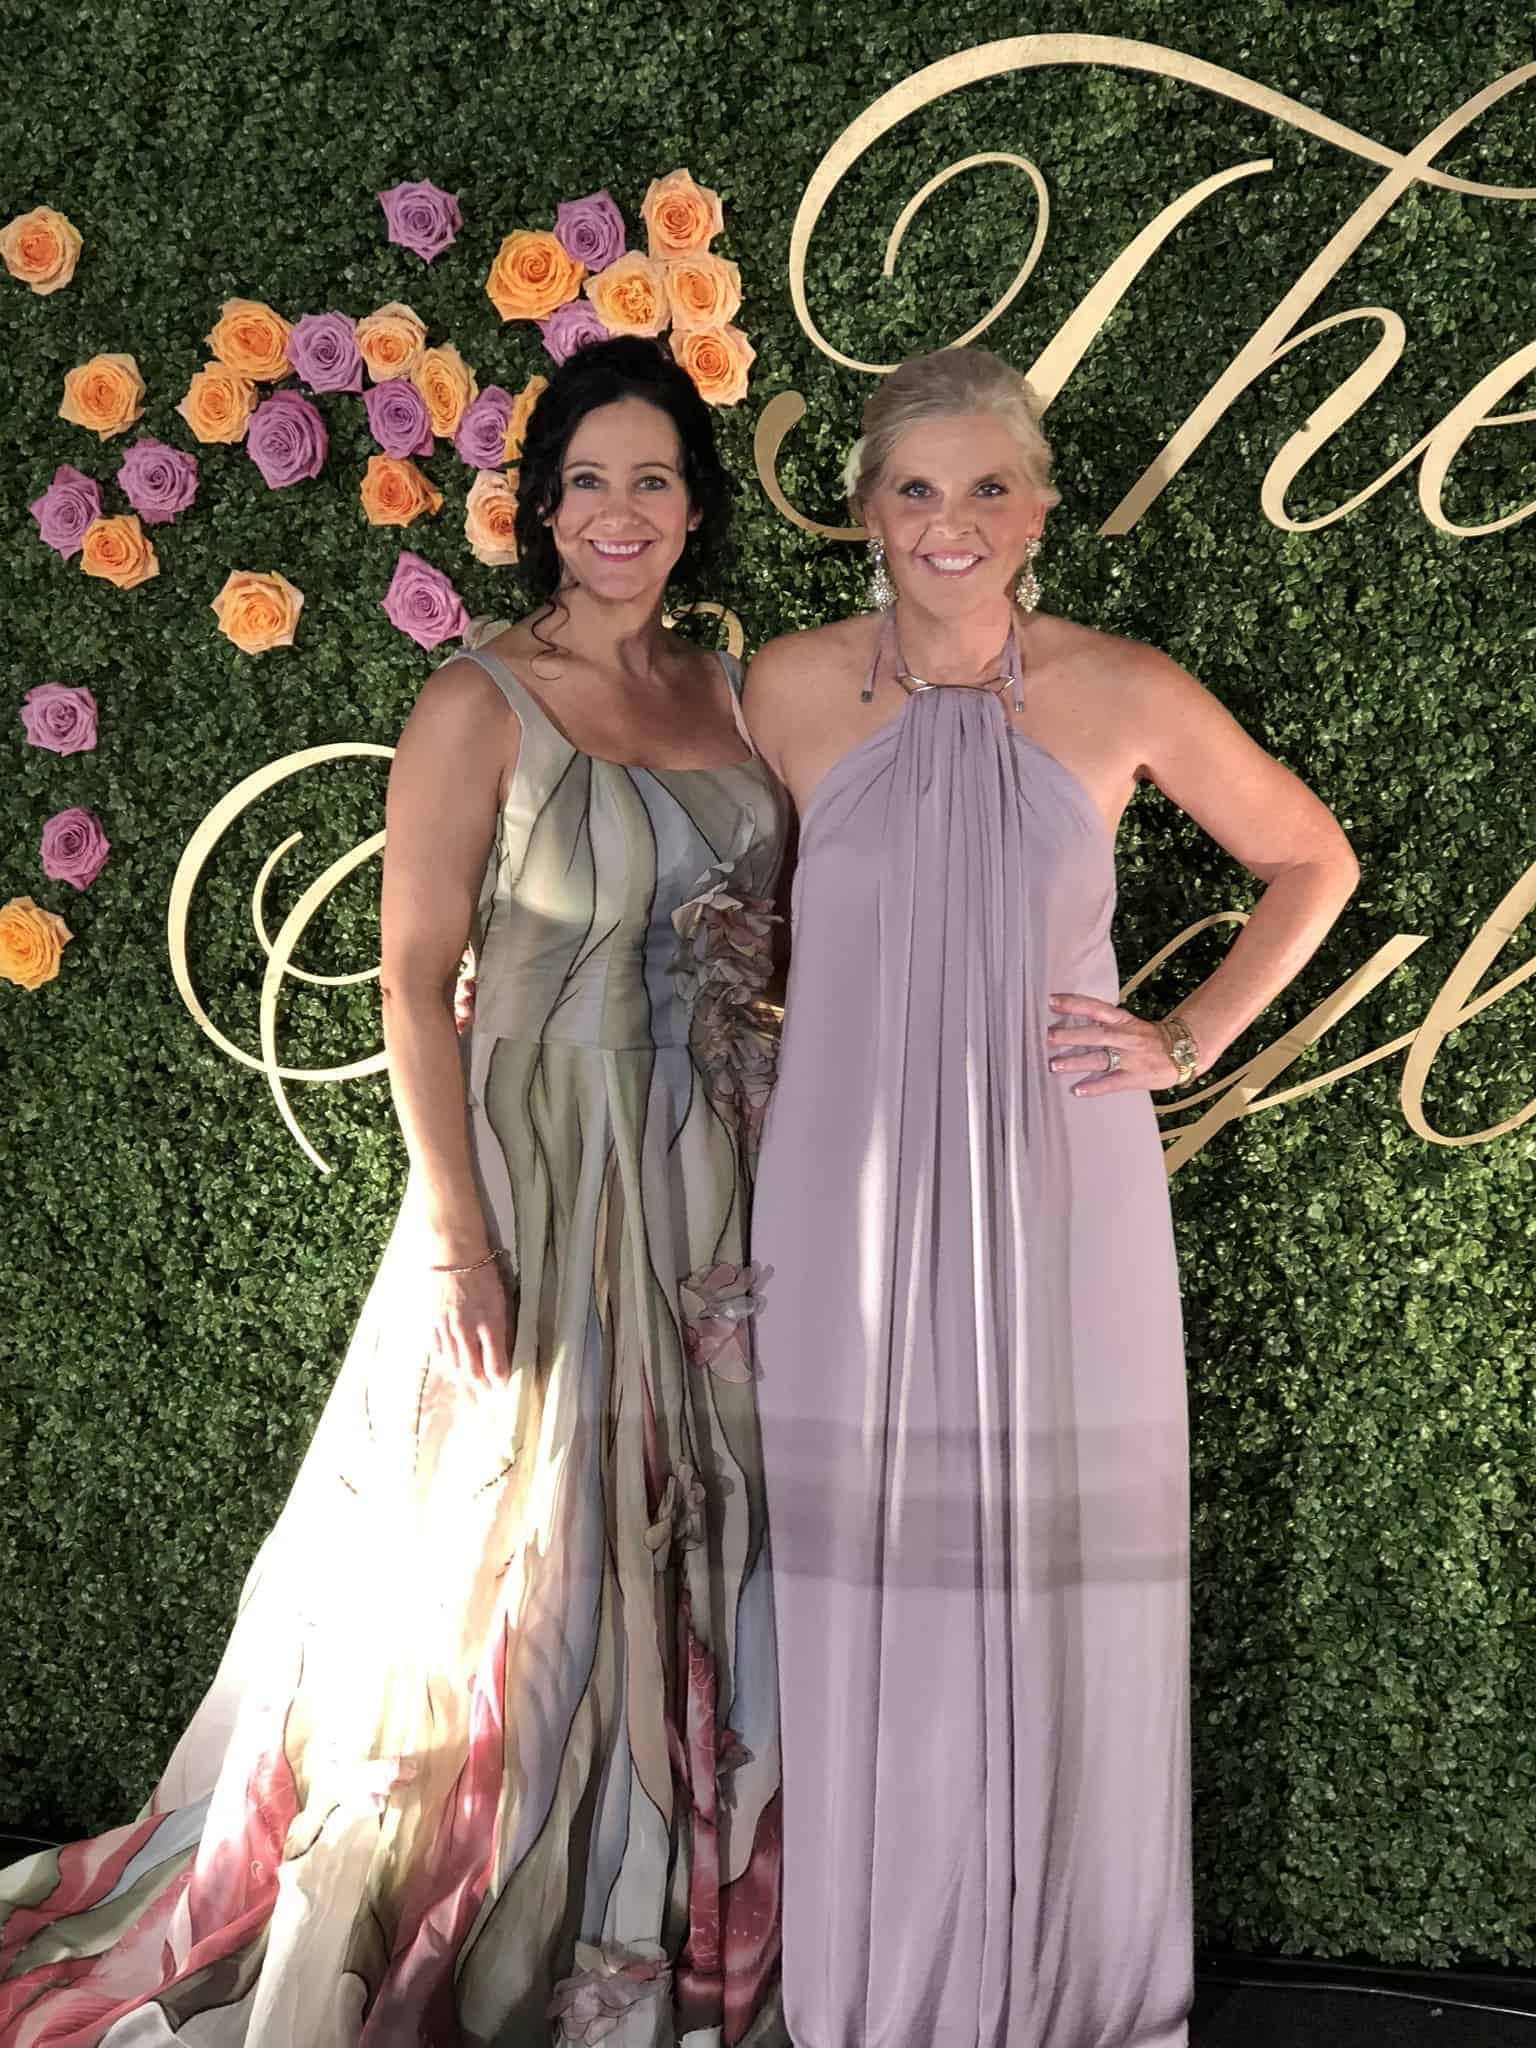 Cindy Klatt and Michelle Long Held